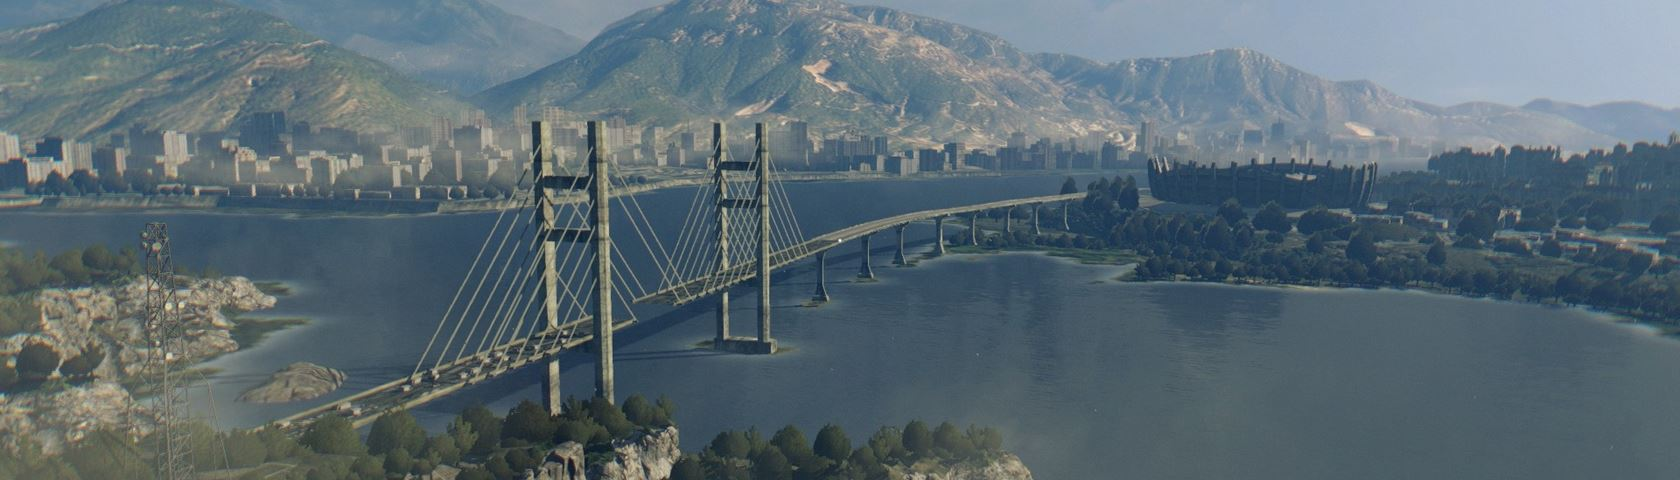 Dying Light The Bridge